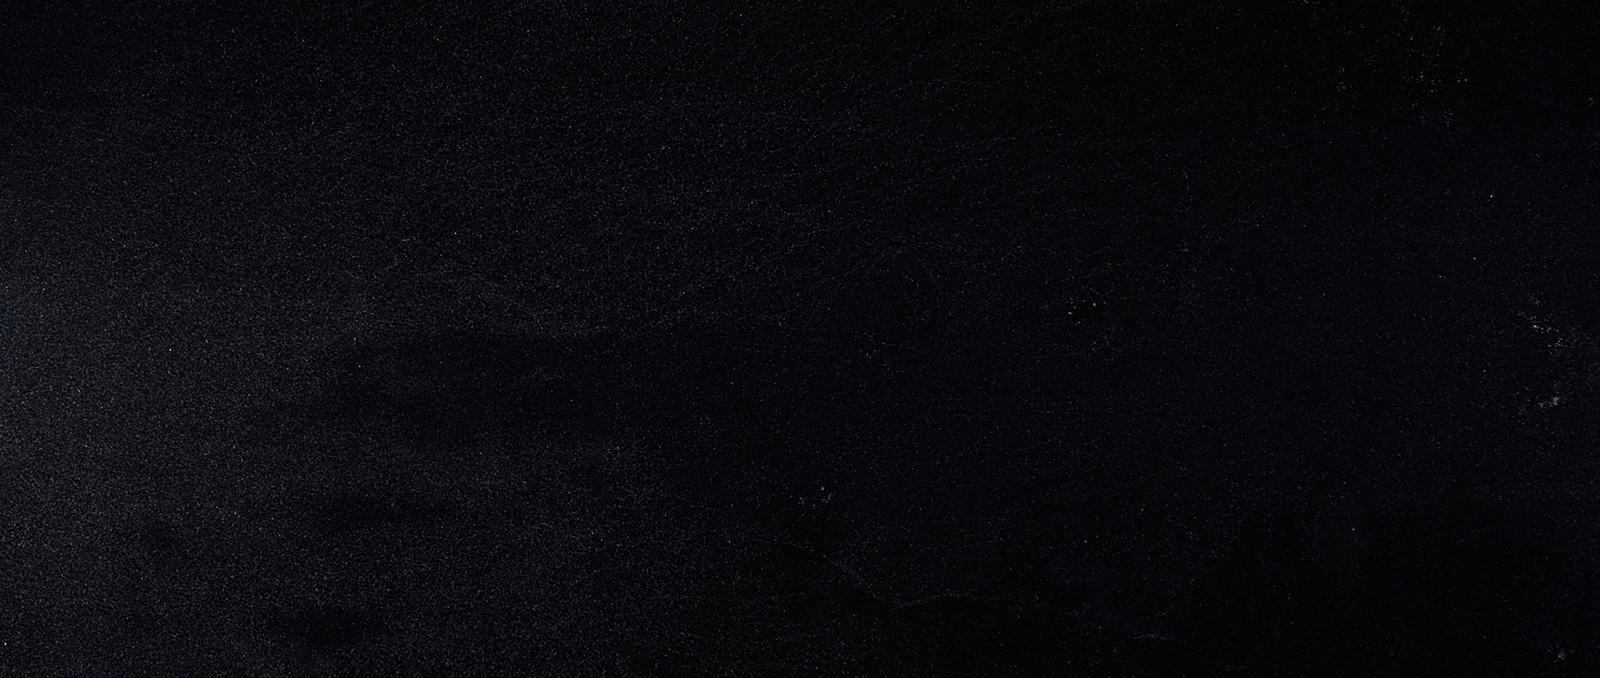 vreaupiatra-granit-negru-absolut-banner